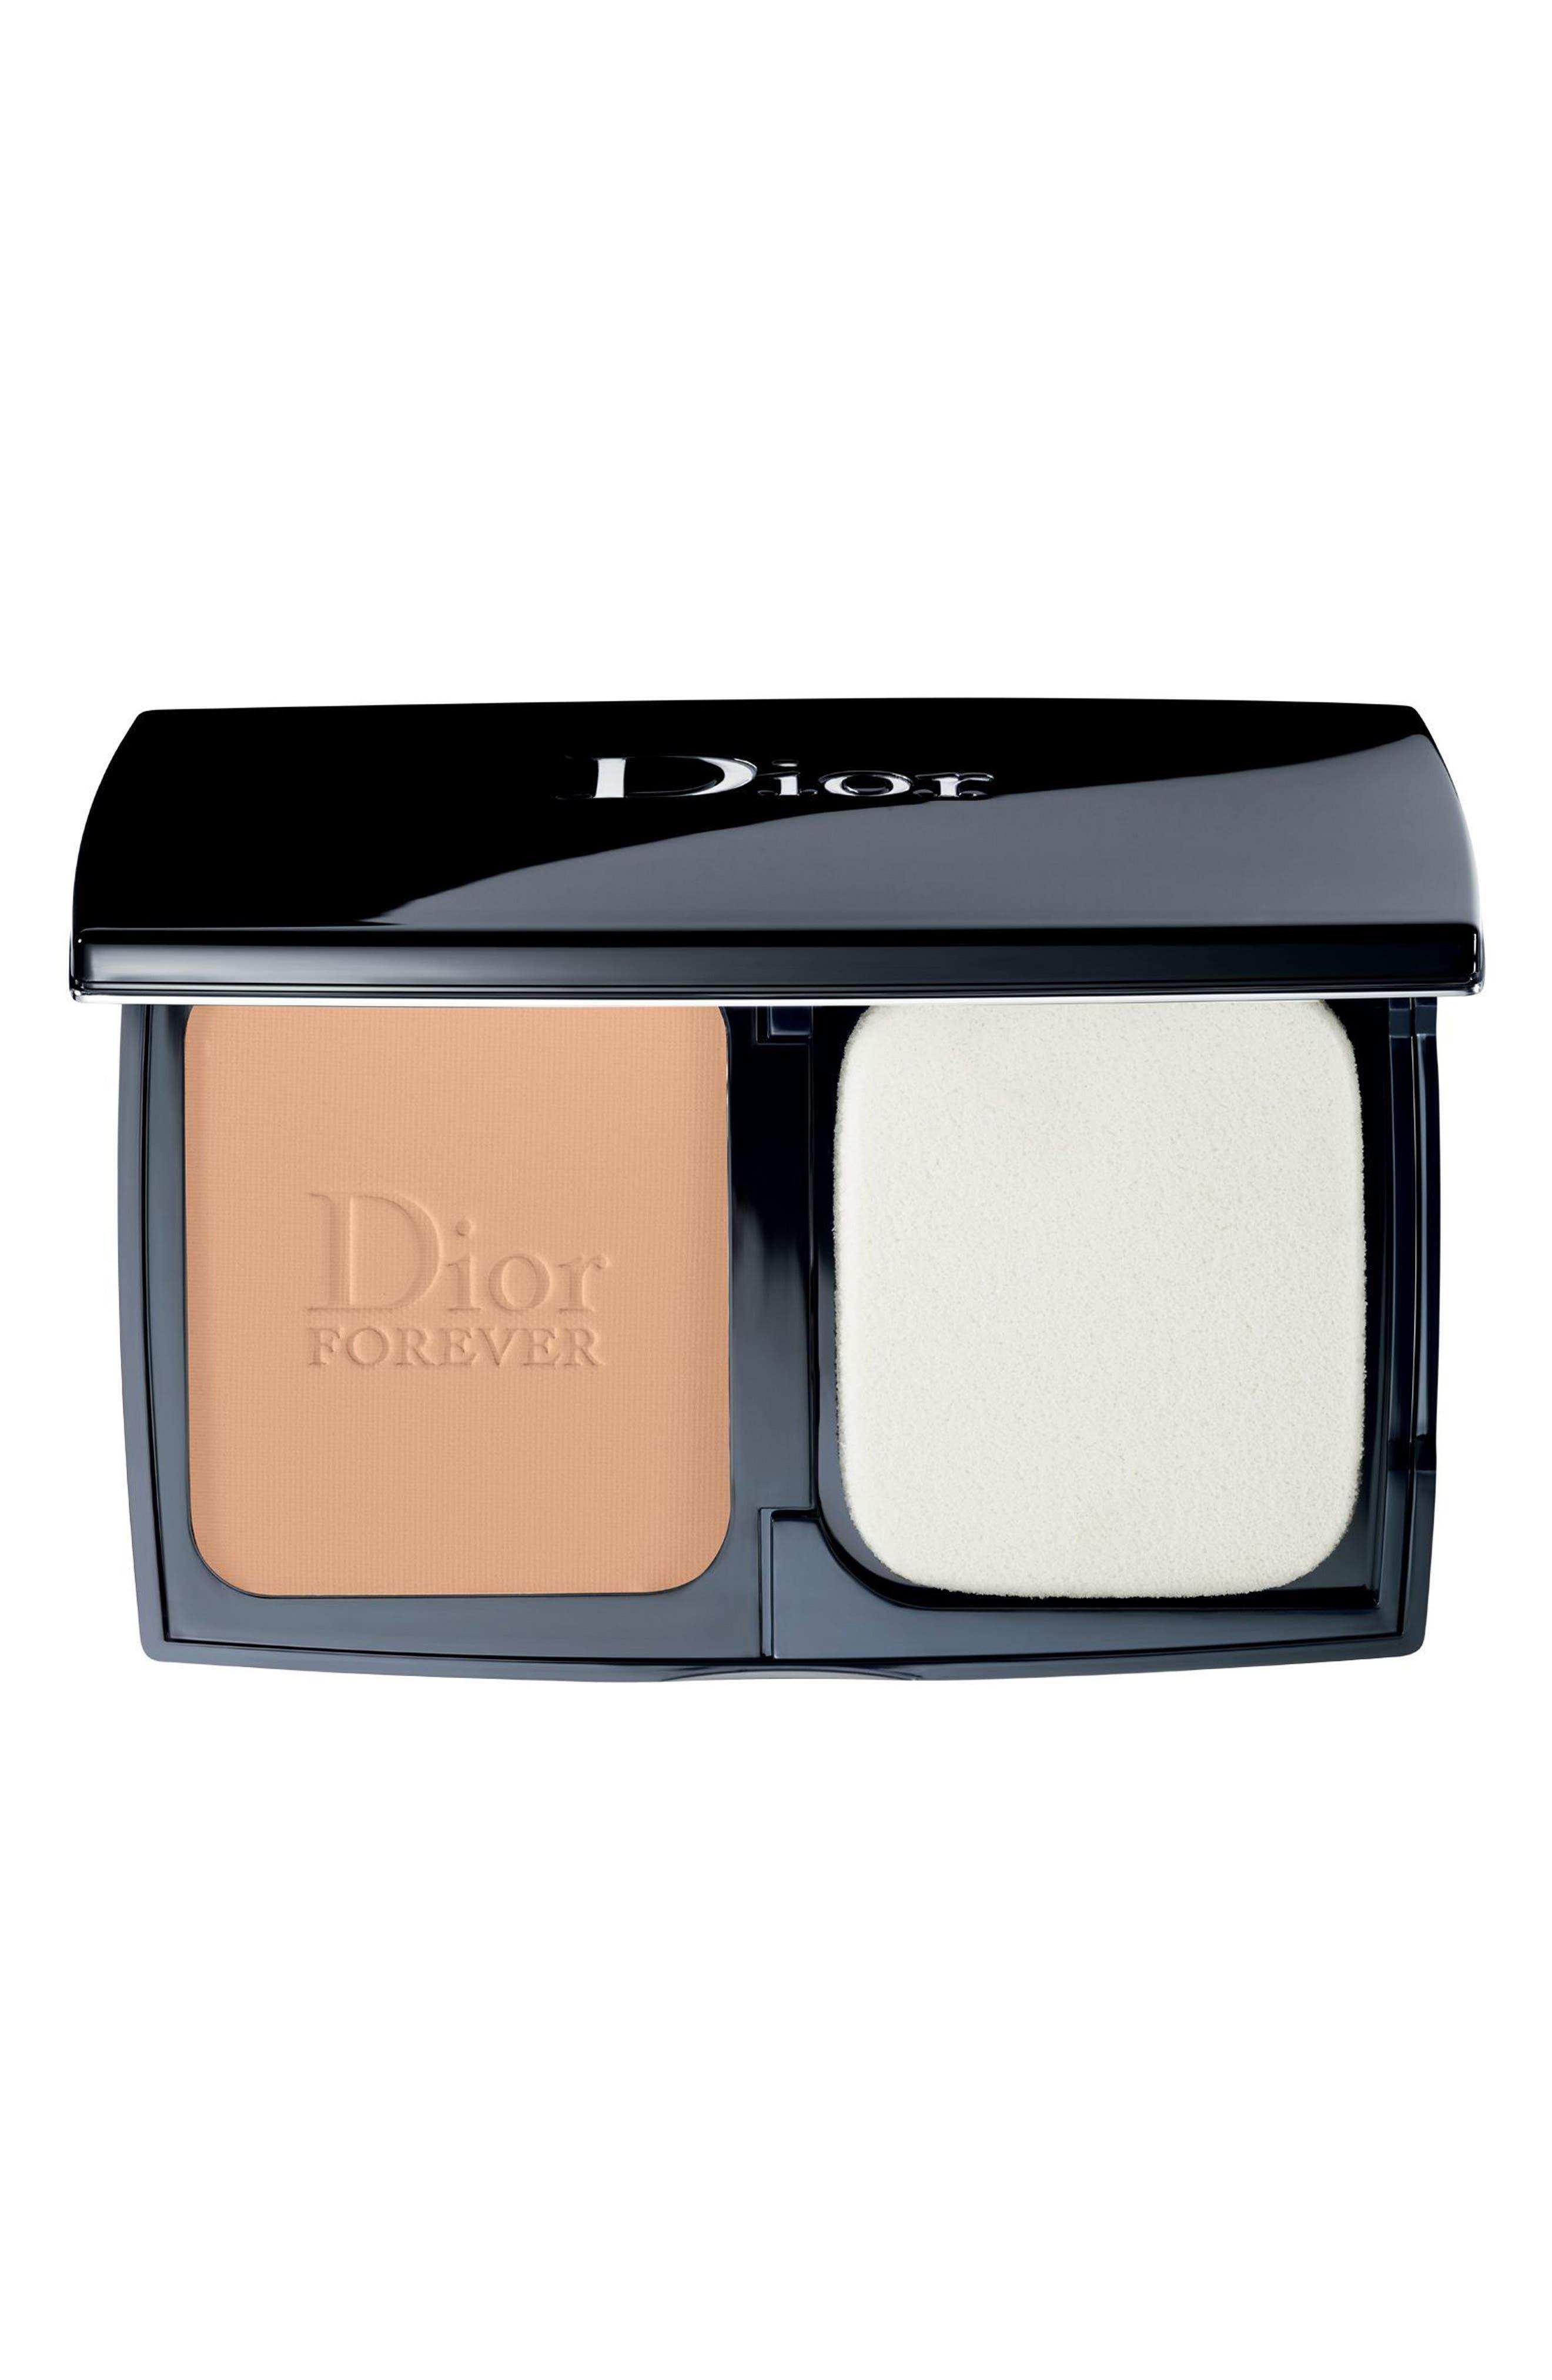 Dior Diorskin Forever Extreme Control - 025 Soft Beige